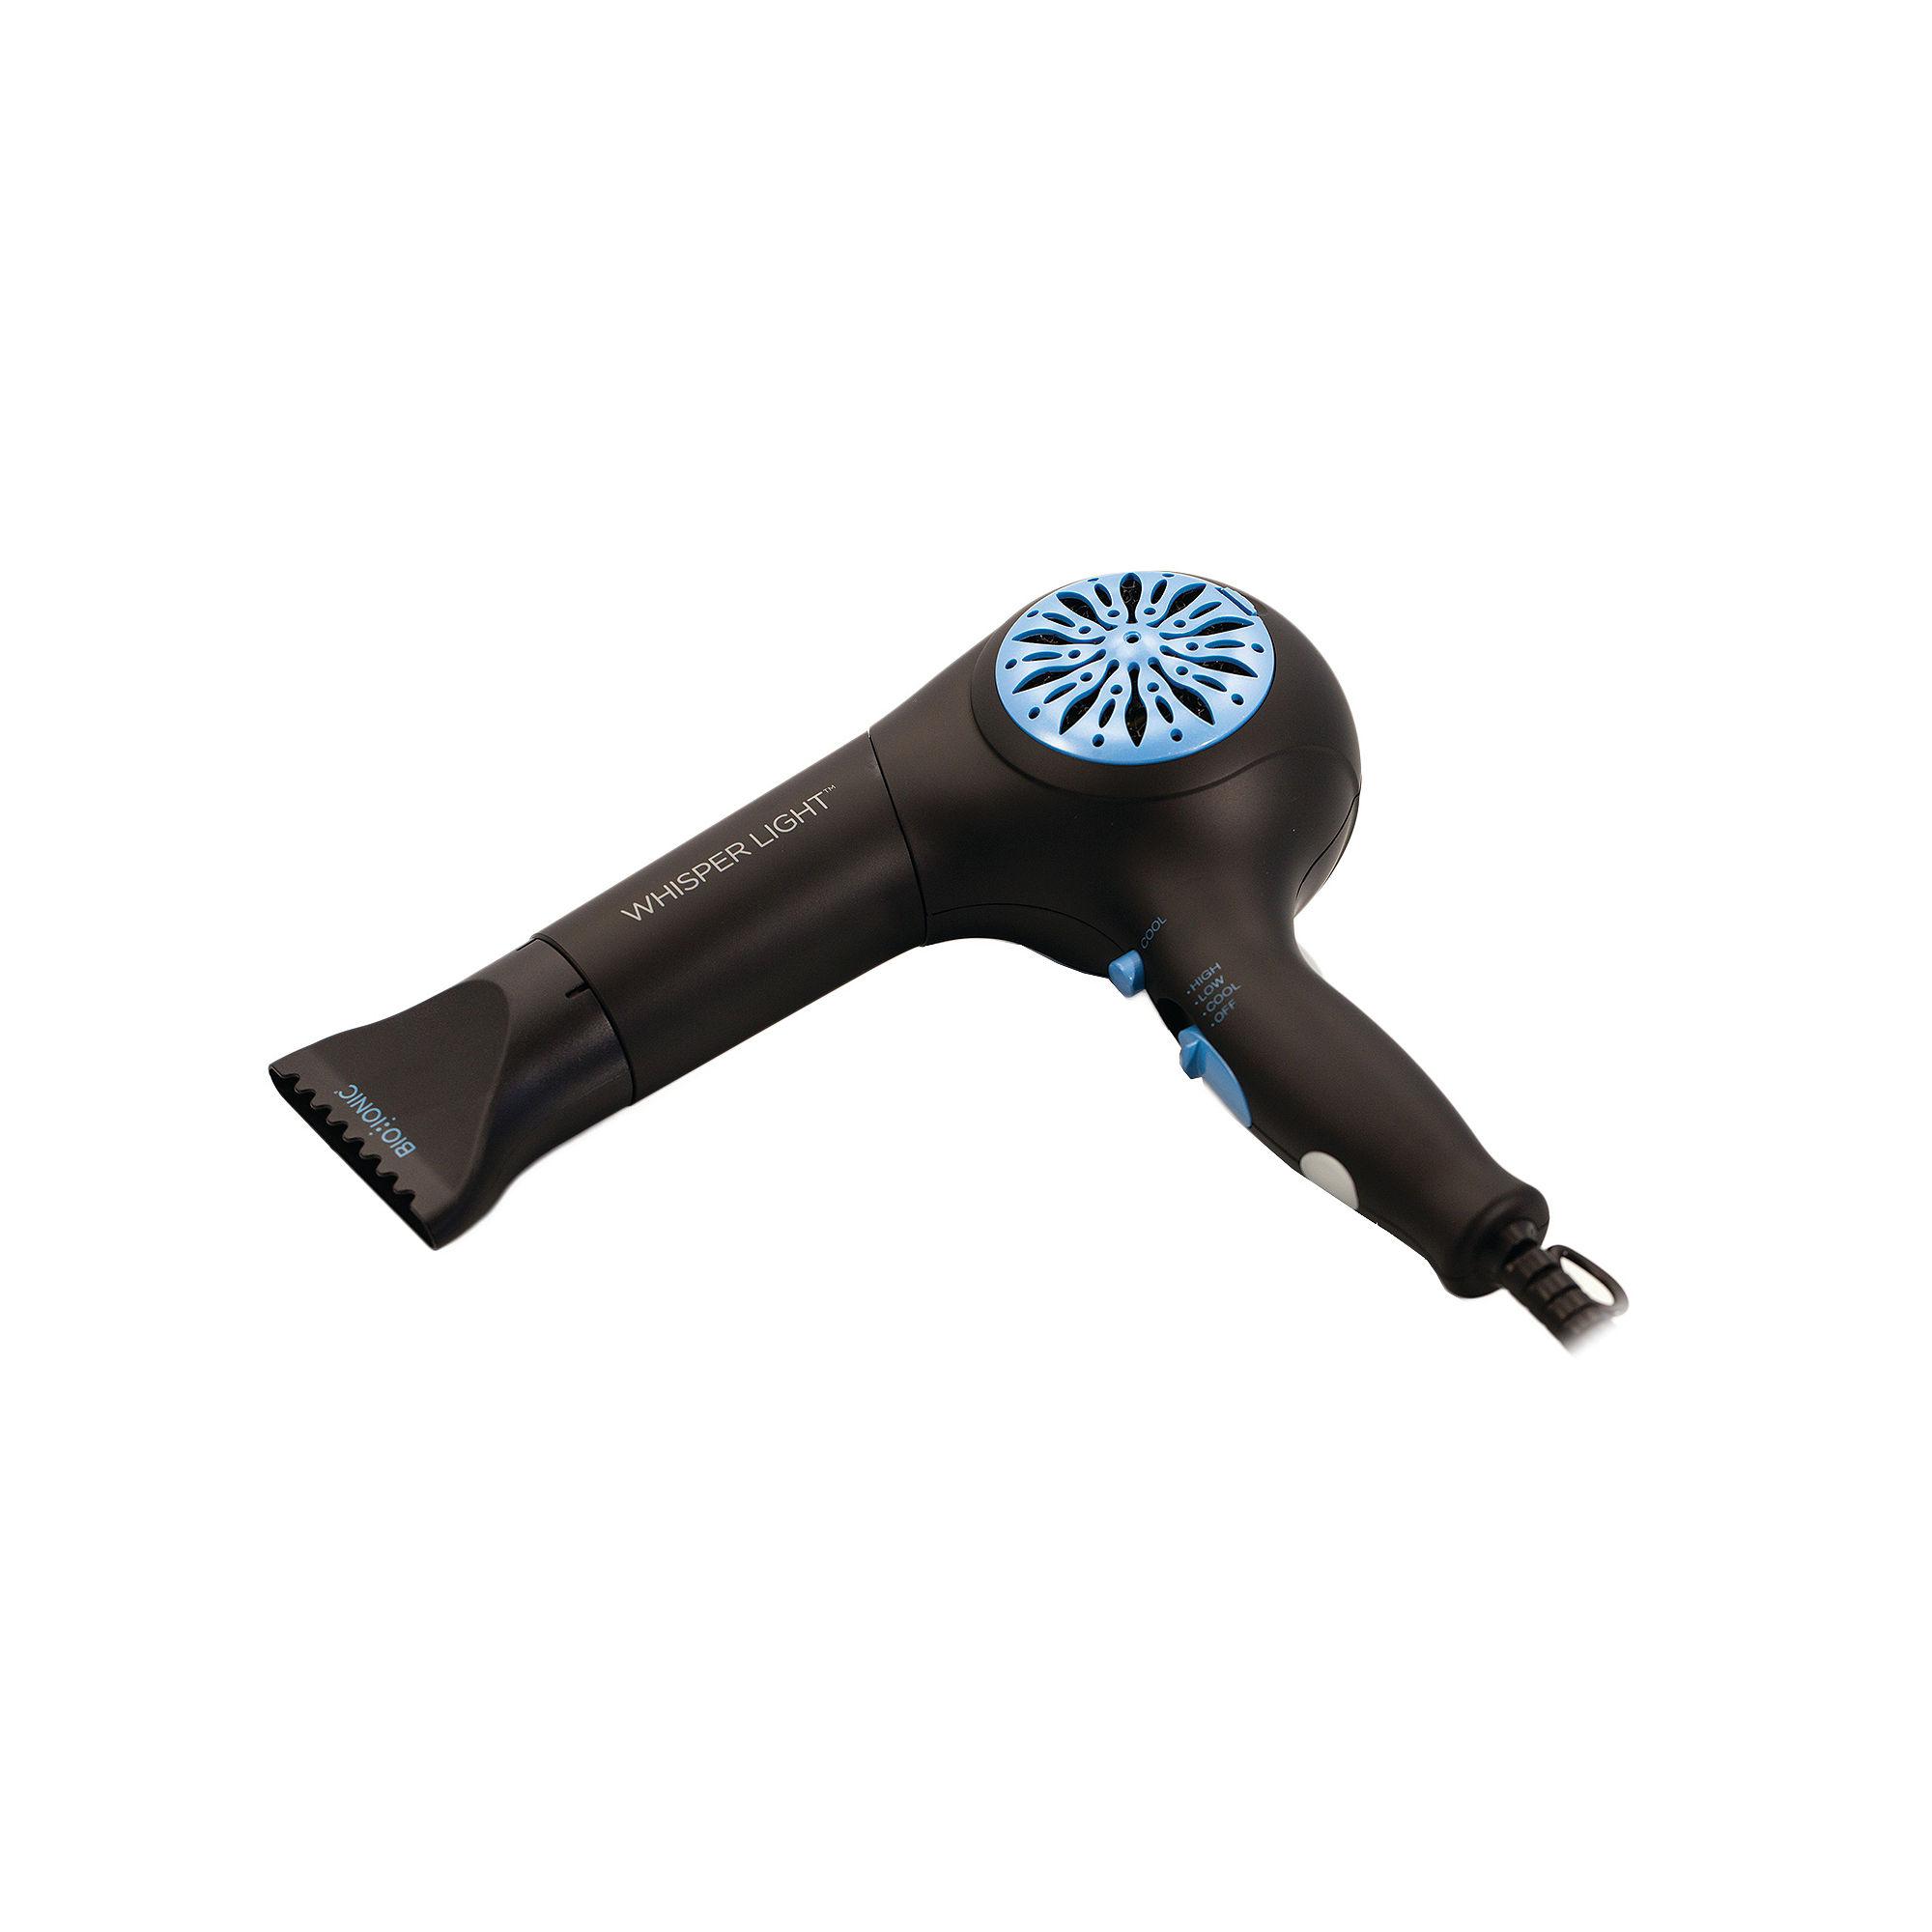 bio ionic whisperlight 1400w professional hair dryer. Black Bedroom Furniture Sets. Home Design Ideas